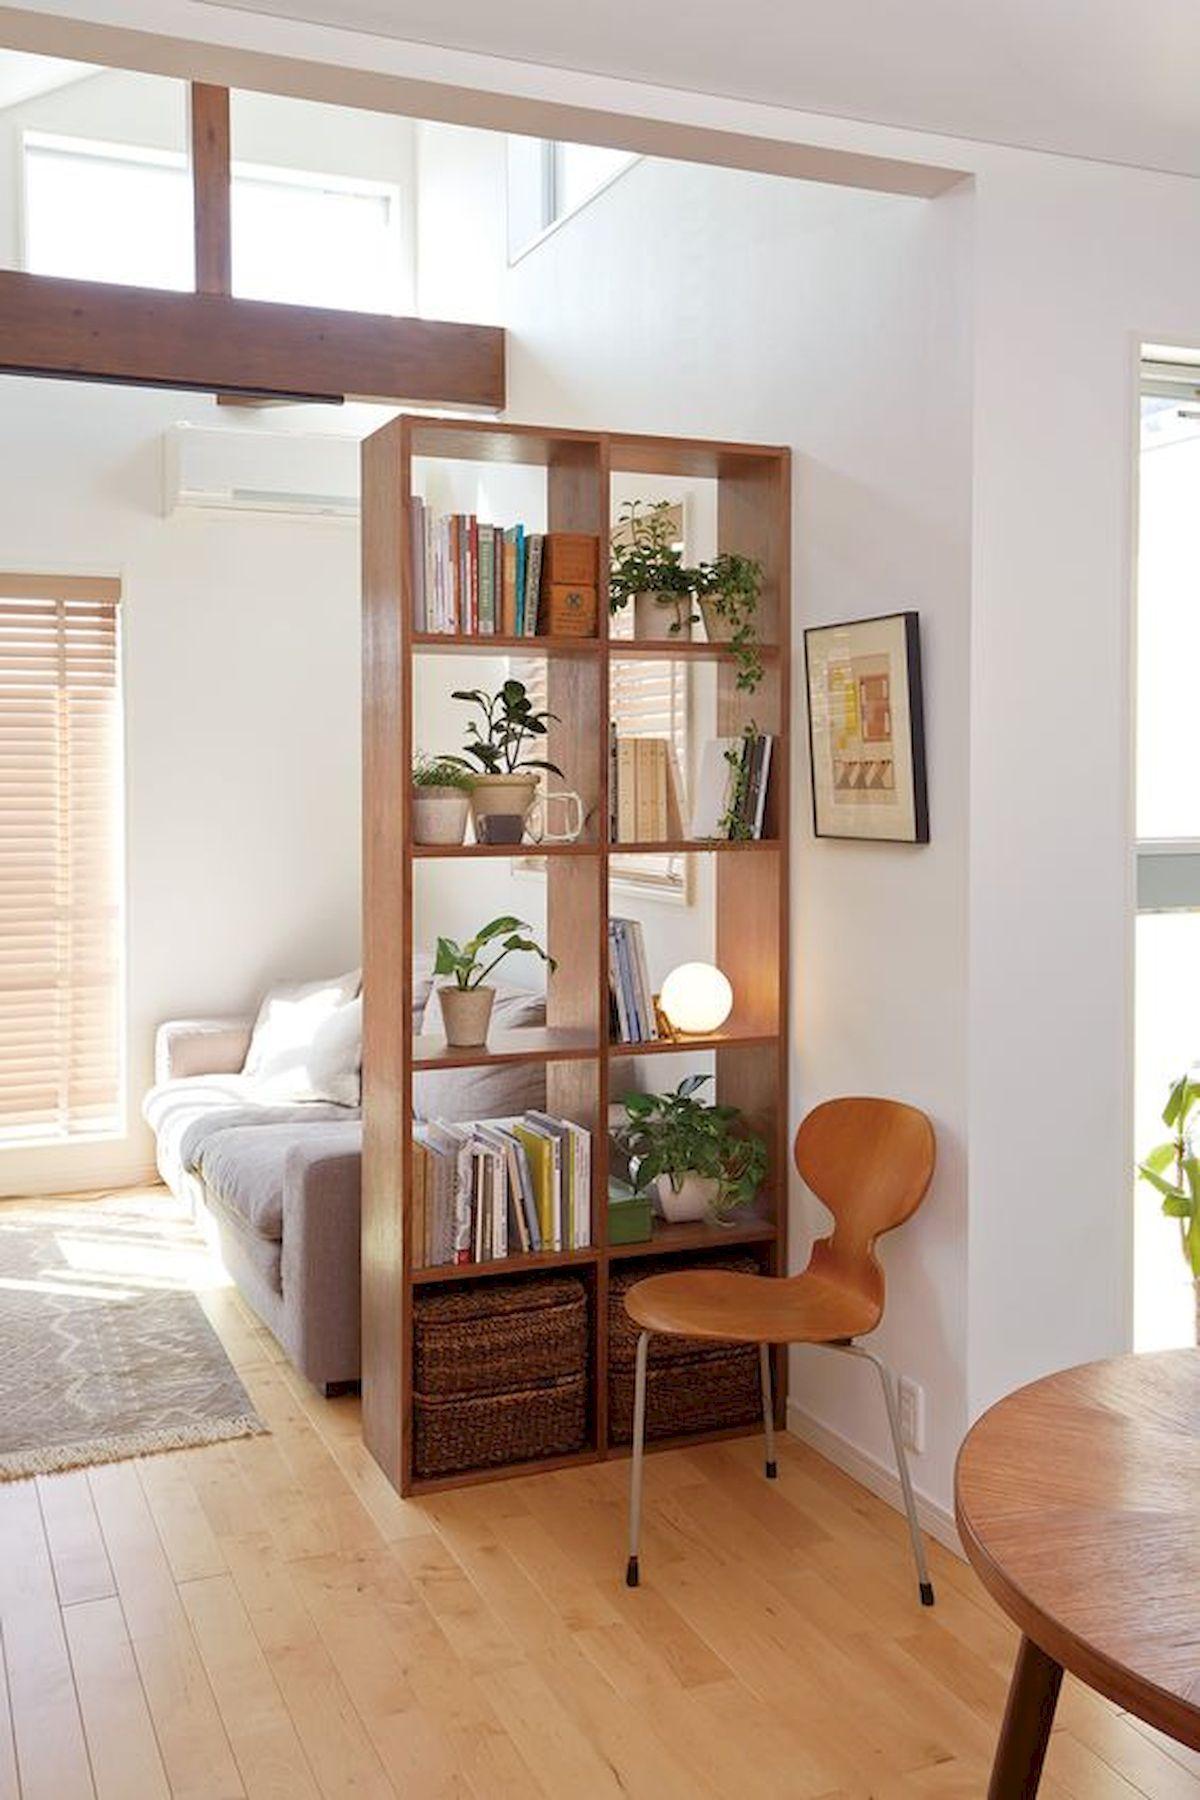 80 Awesome DIY Projects Pallet Shelves and Racks Design Ideas – CoachDecor.com